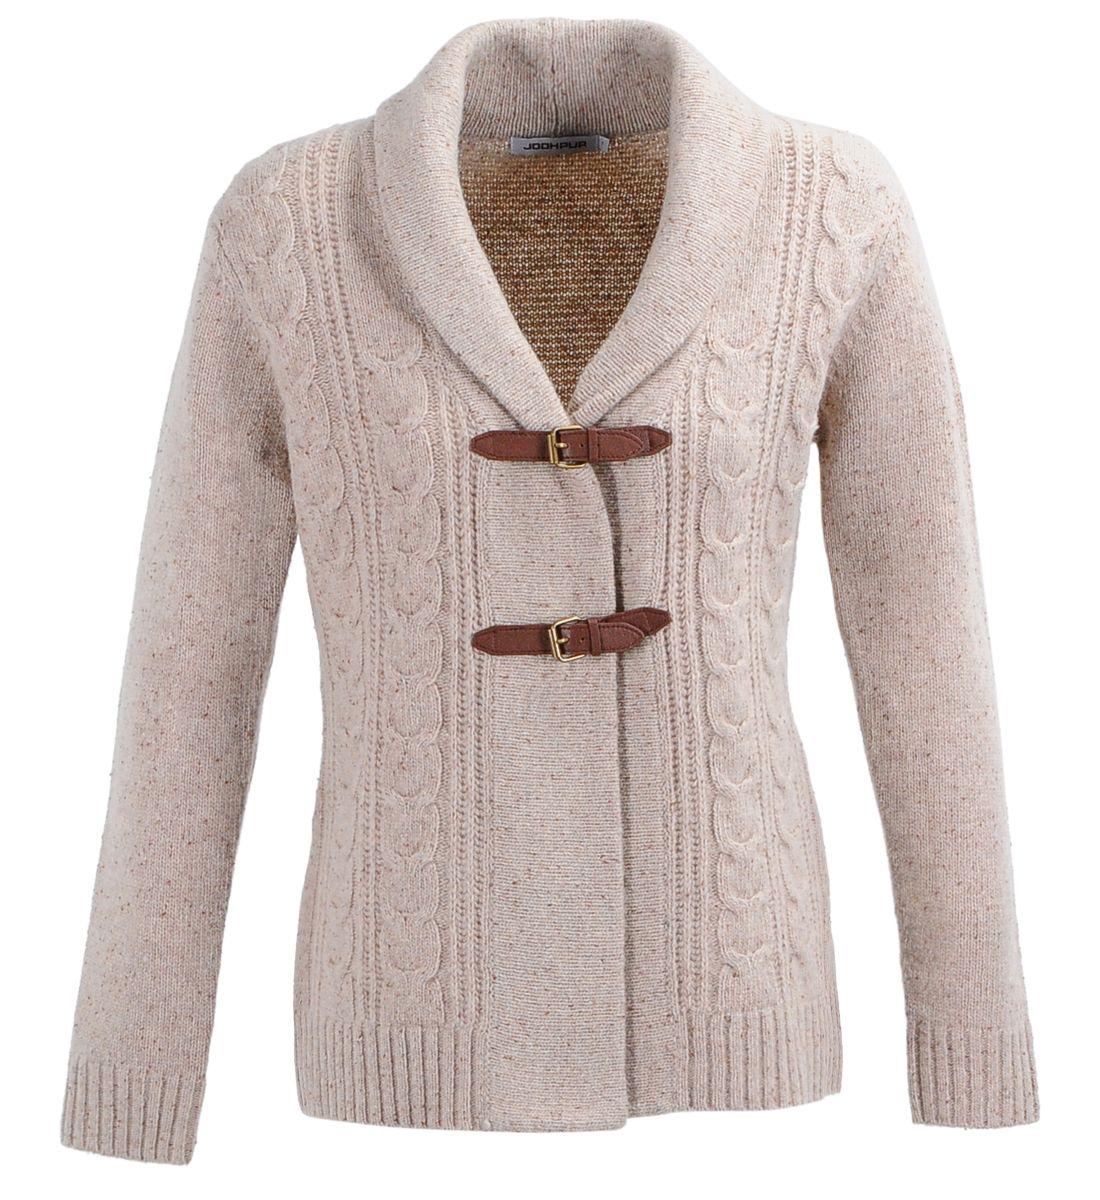 Veste laine fine femme